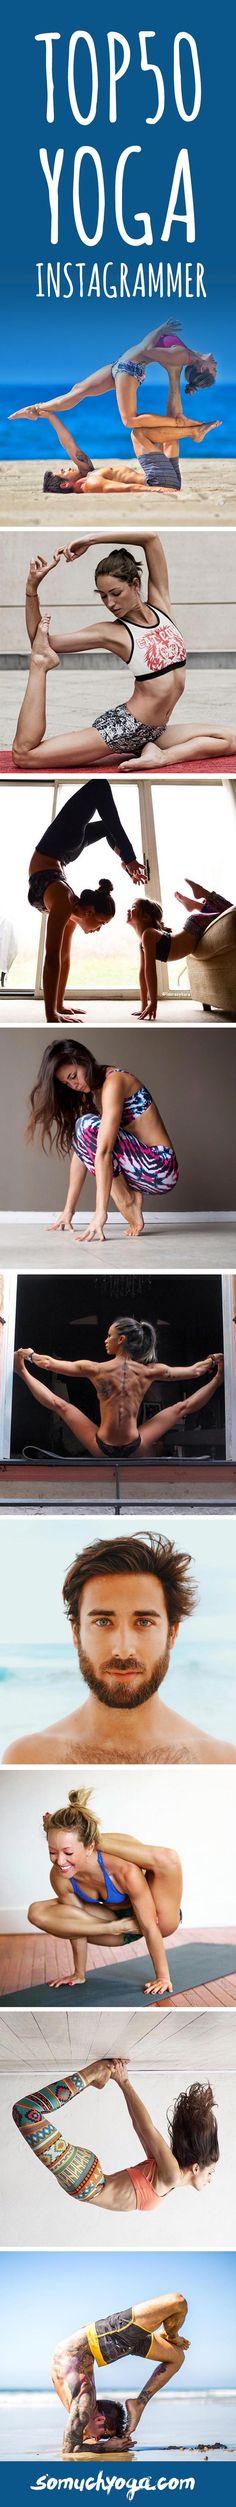 TOP50 Inspiring #Yoga Accounts on #Instagram